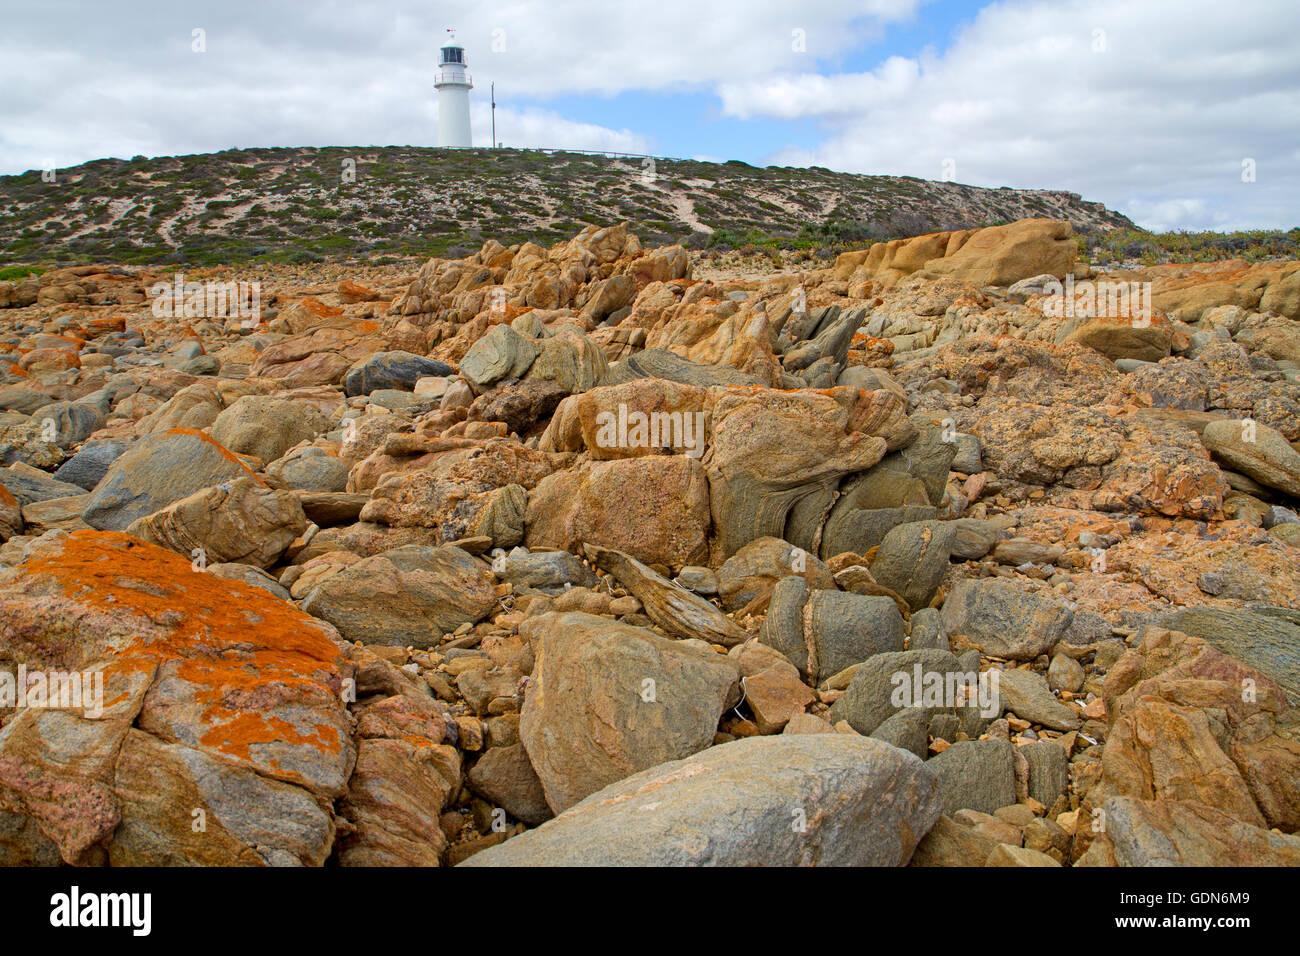 Corny Point Lighthouse on the Yorke Peninsula - Stock Image